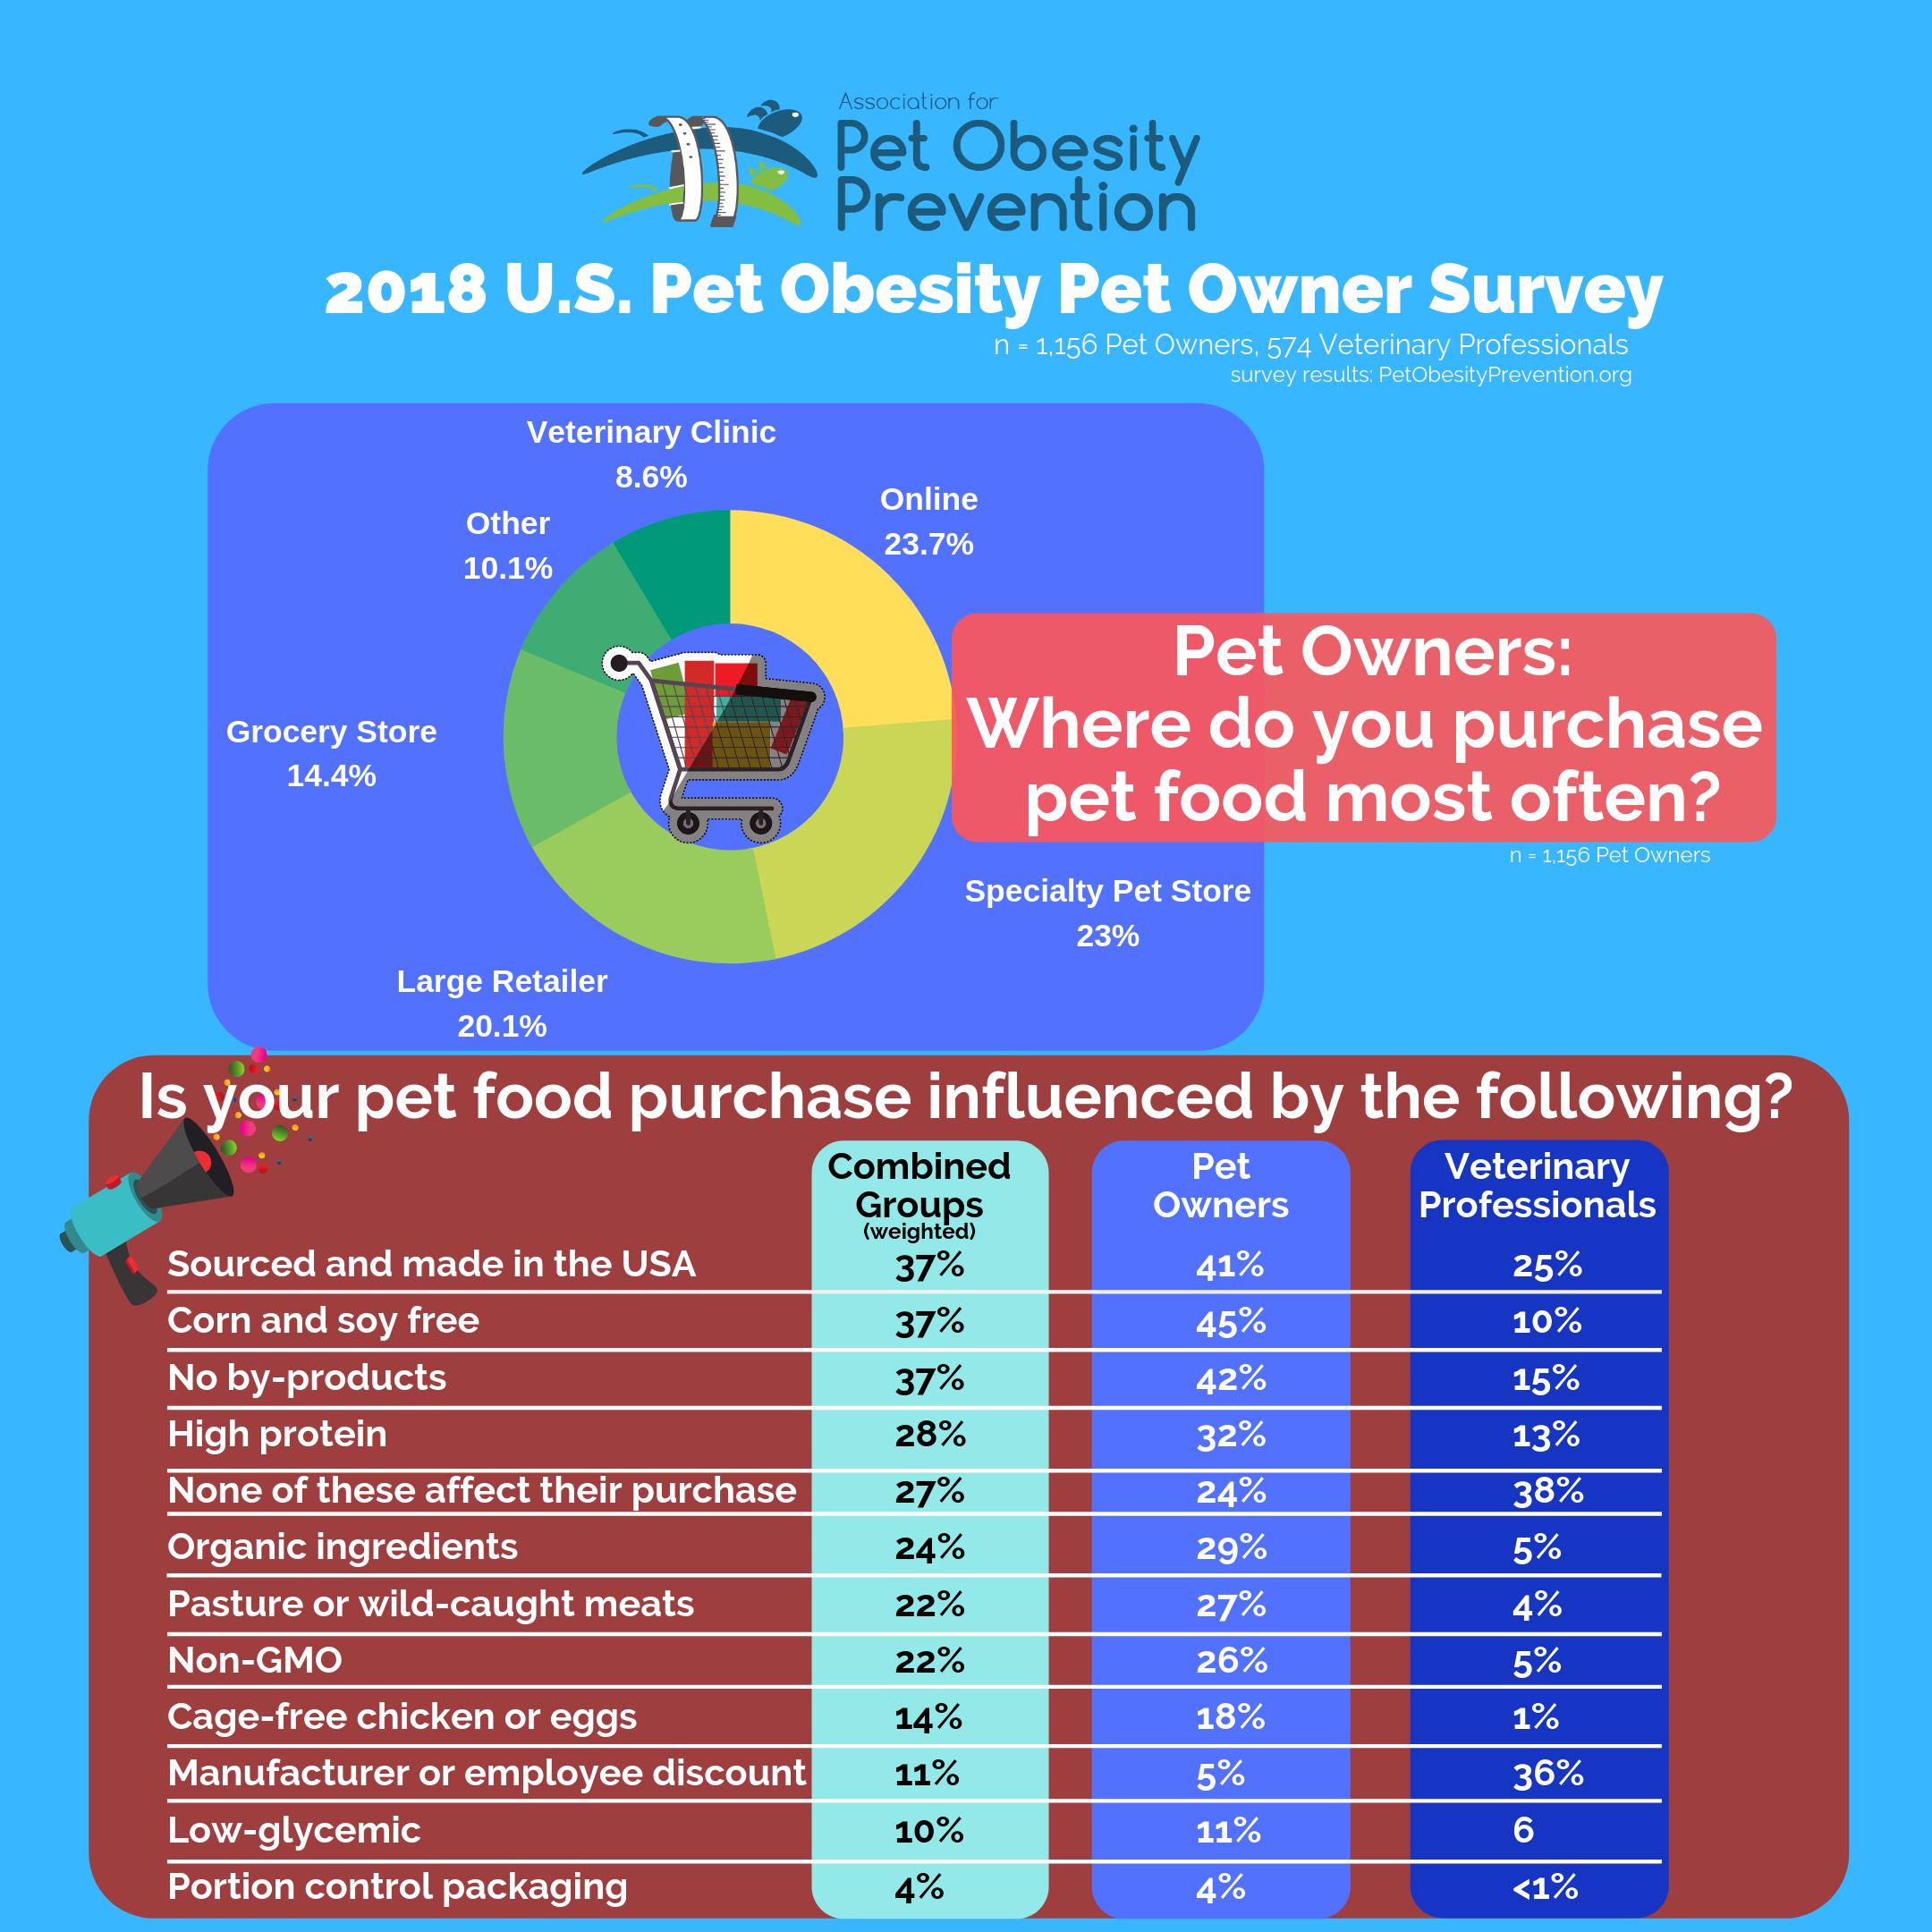 Pet Food Purchasing